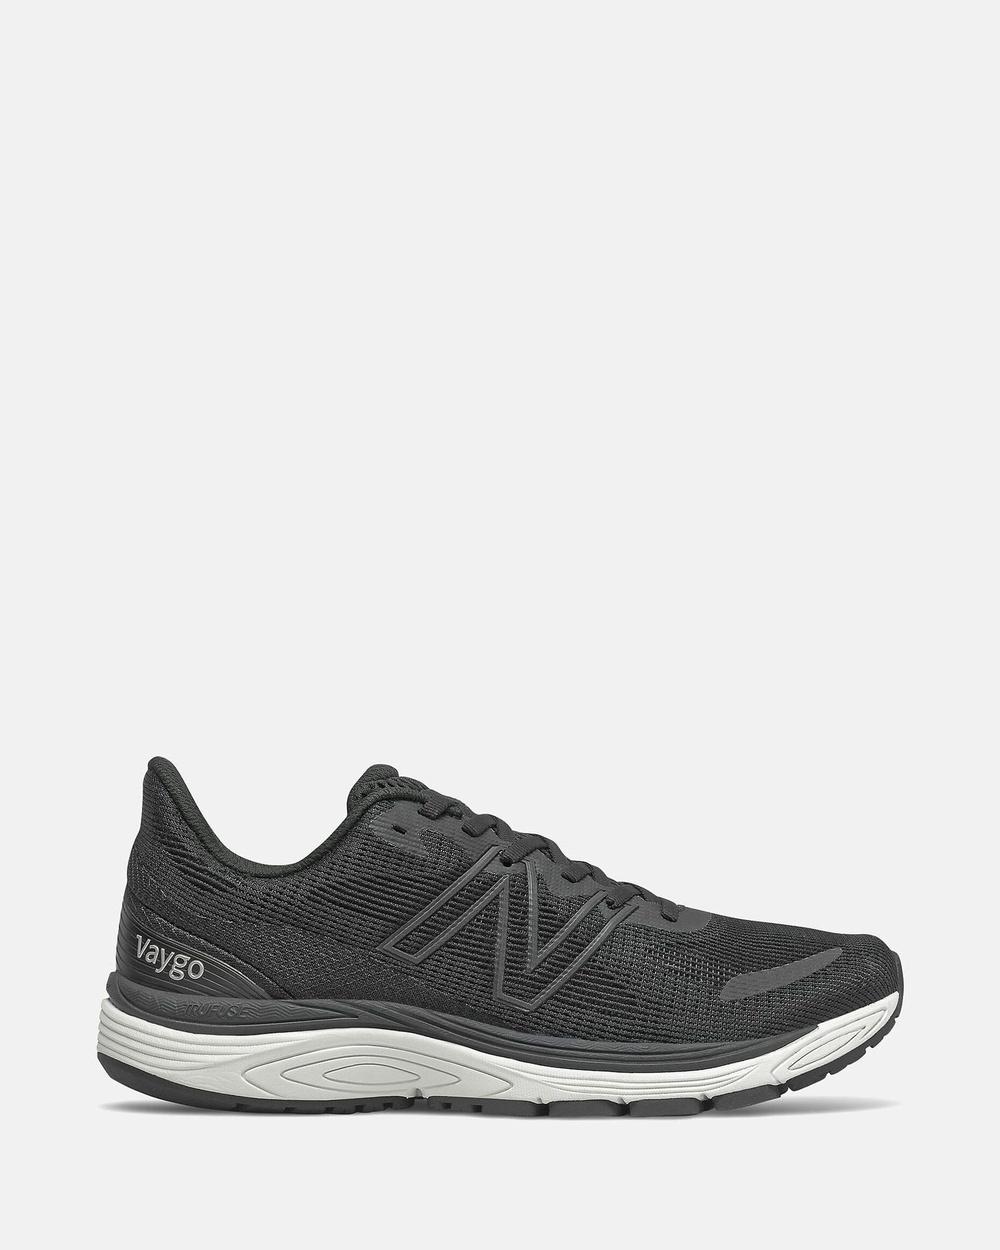 New Balance MVYGOV2 Standard Fit Men's Performance Shoes Black Australia